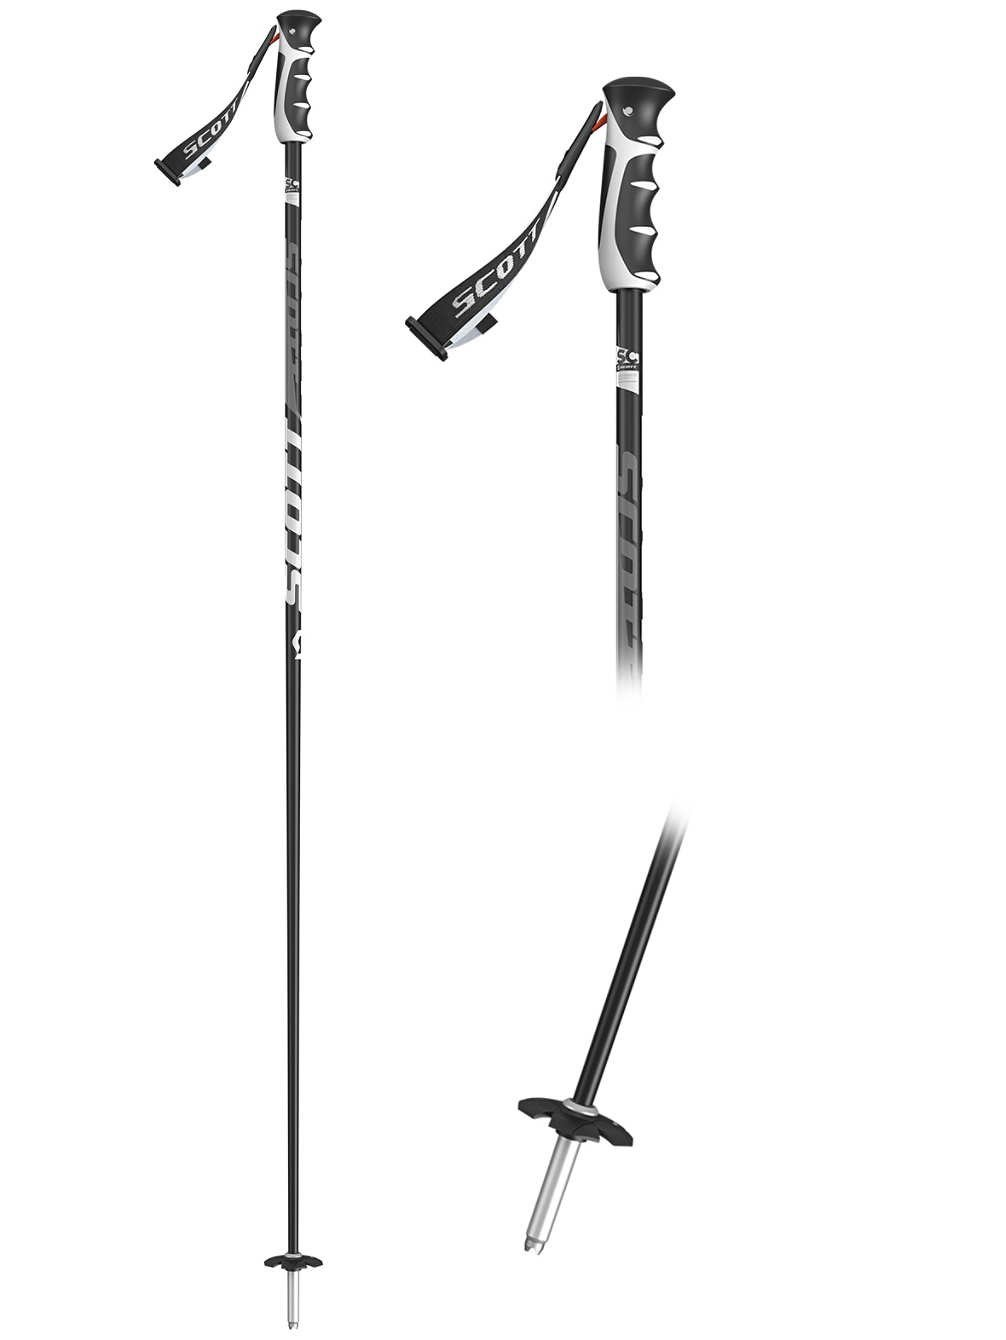 Scott Herren Skistock Pro Taper SRS 130cm 2018 SkistÃcke